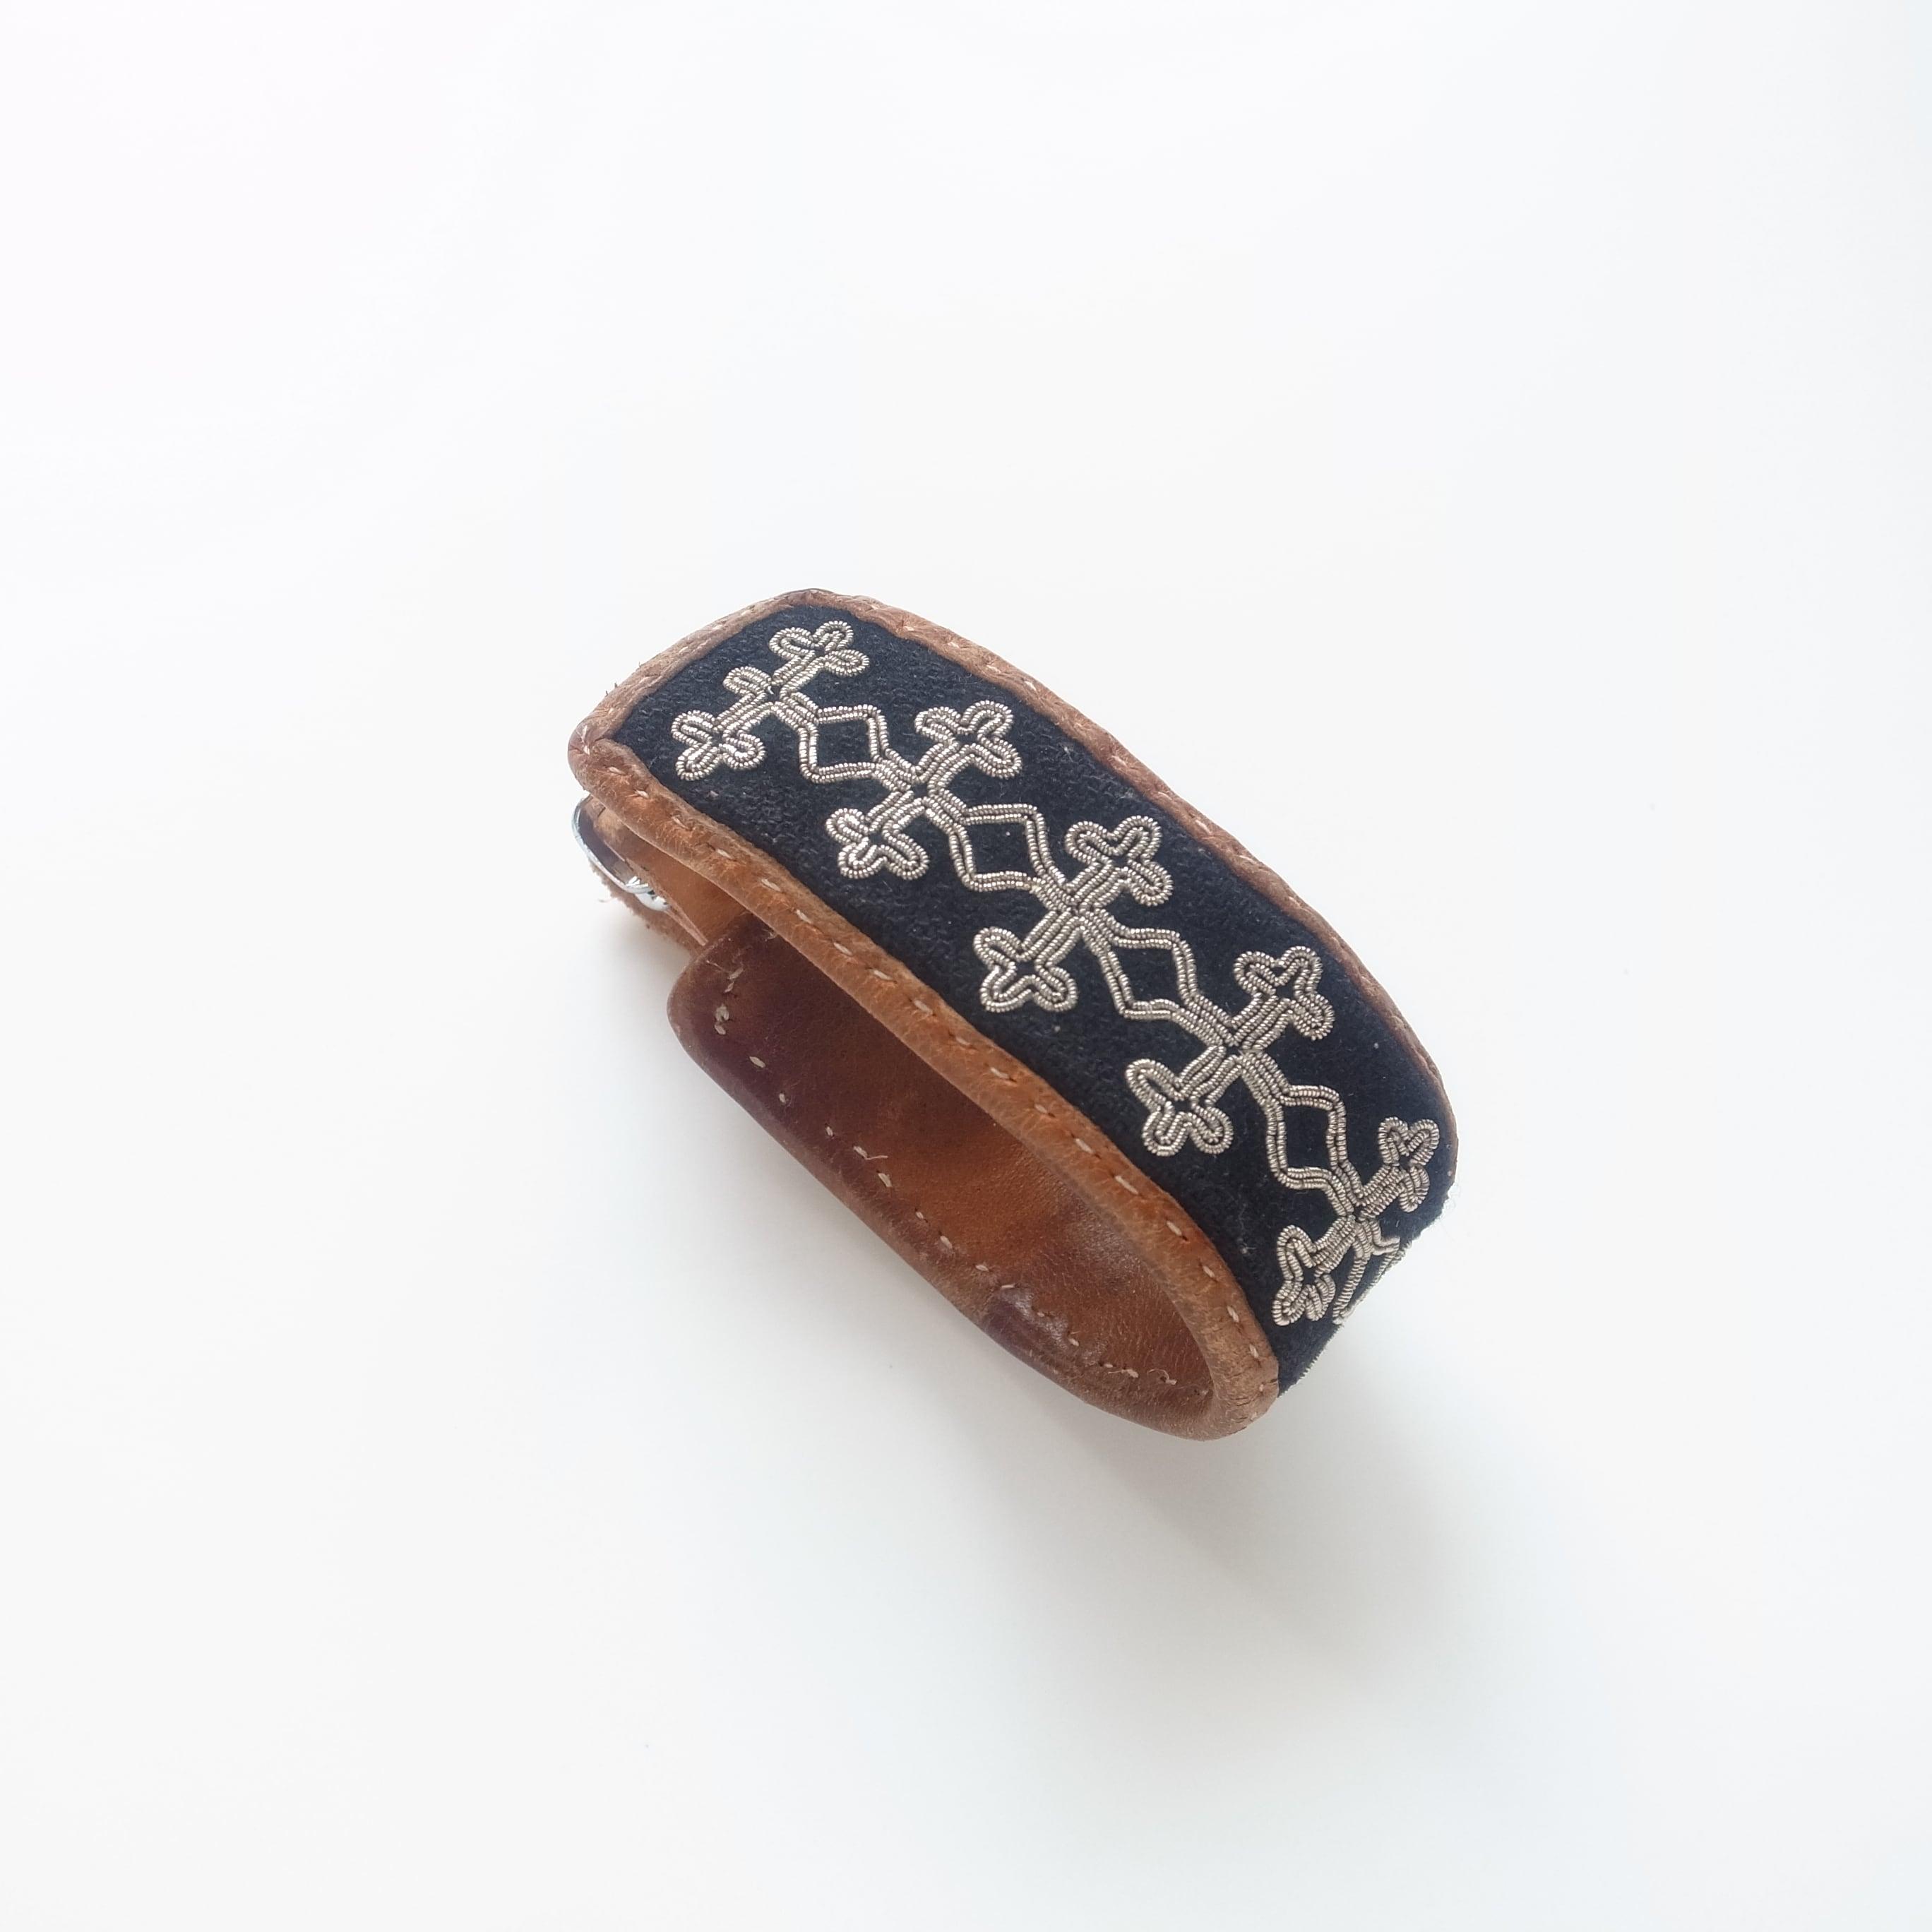 Sami pewter bracelet